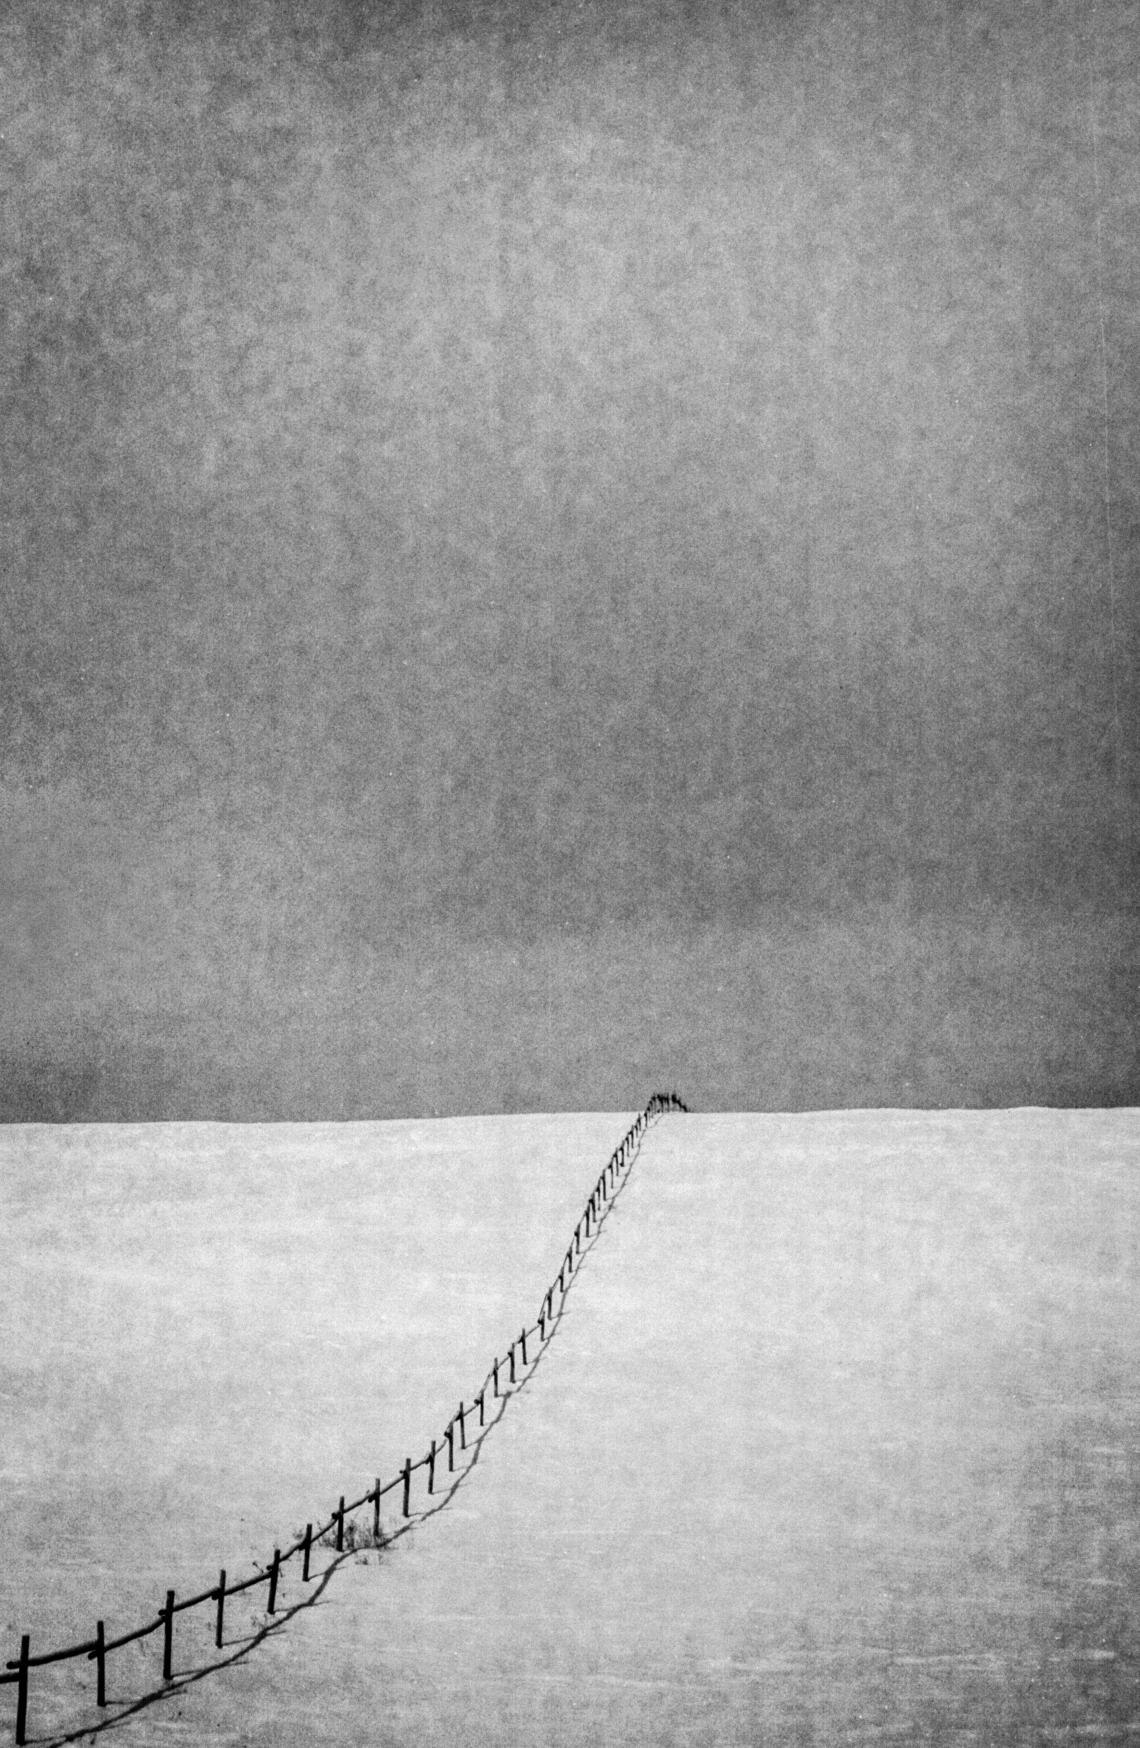 SnowFence1